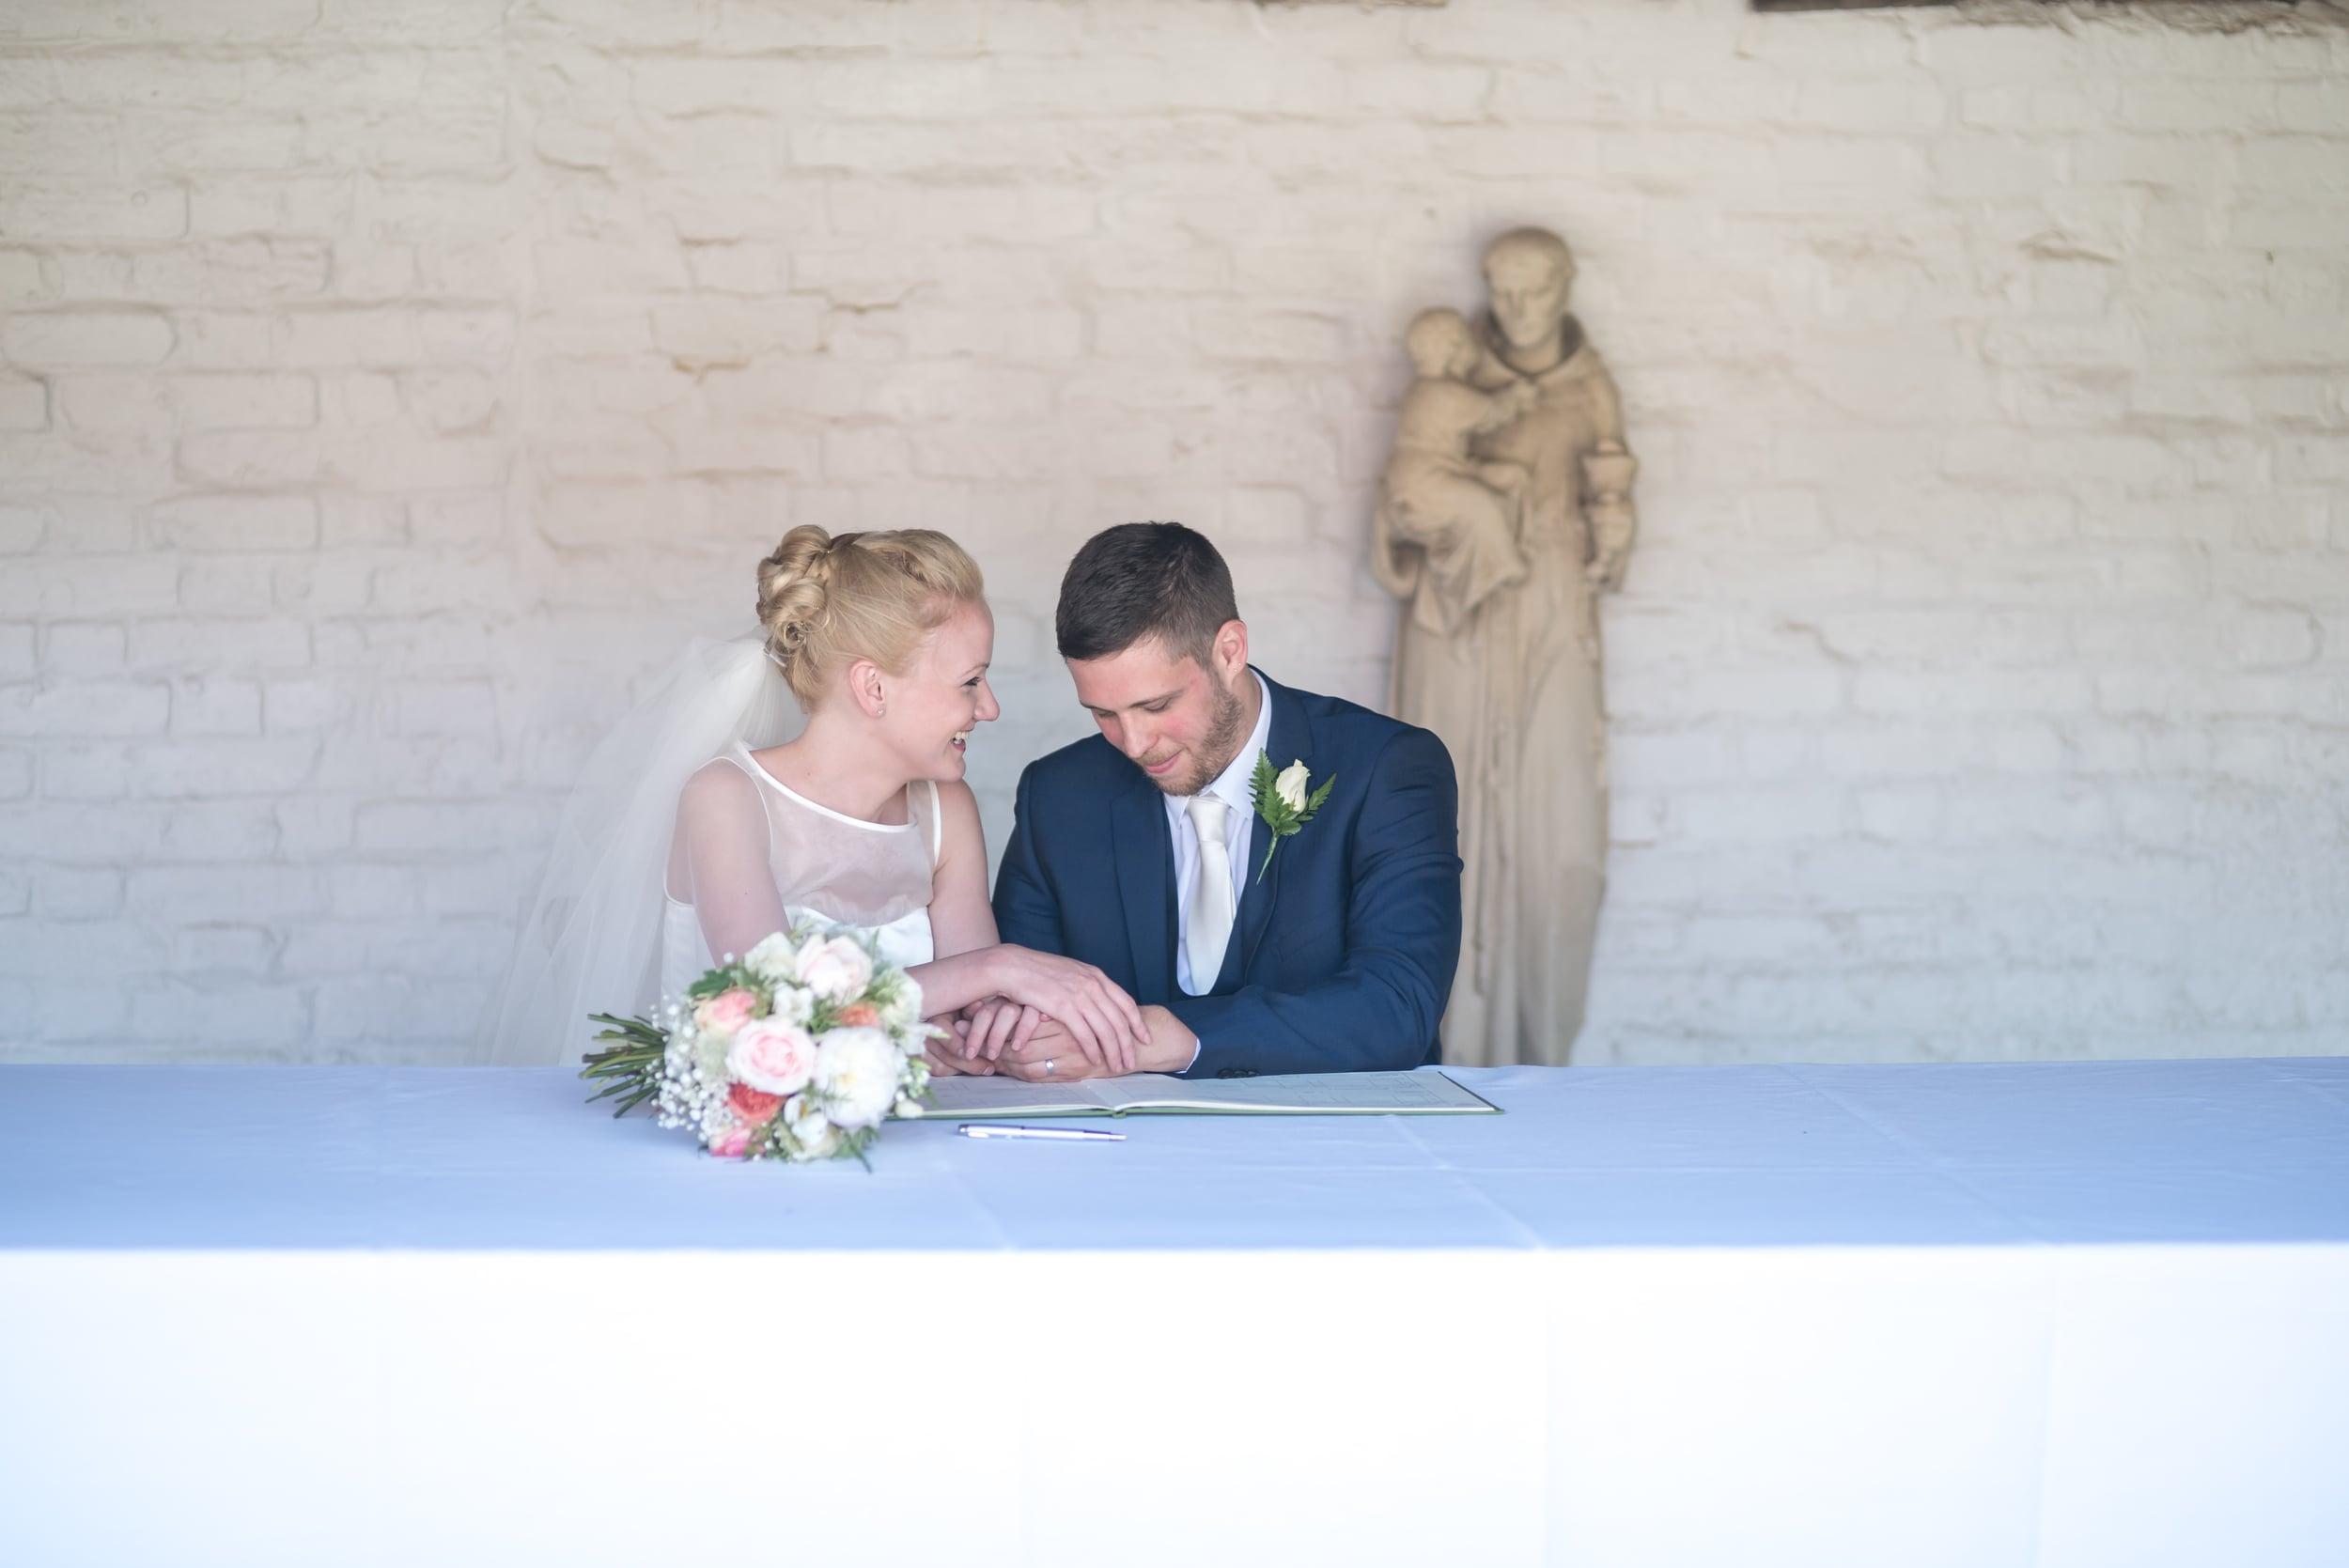 lillibrooke Manor, Berkshire, wedding, Photography